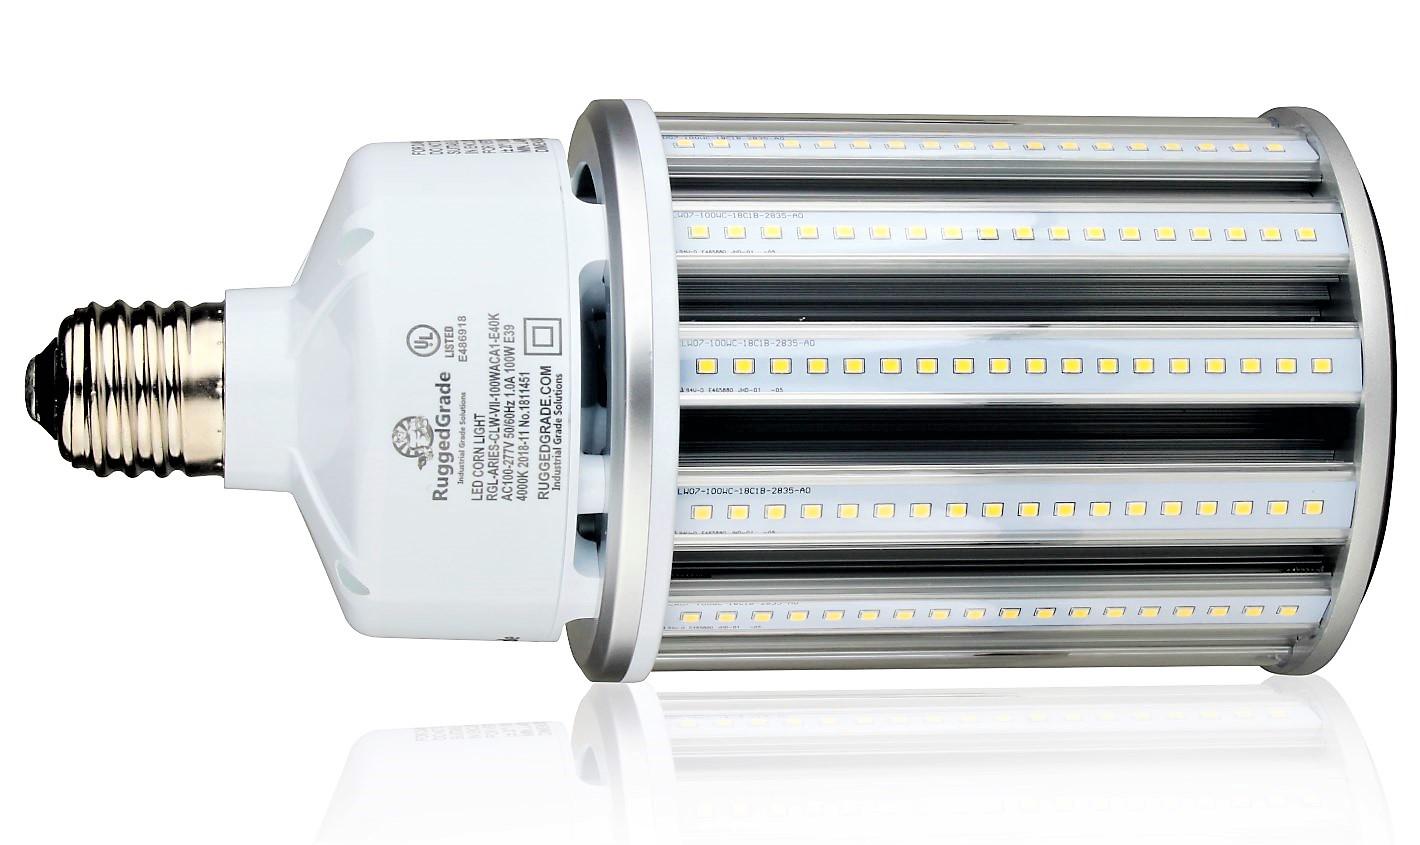 100 watt e39 led corn bulb aries series 13 000 lumens 5000k fanless. Black Bedroom Furniture Sets. Home Design Ideas